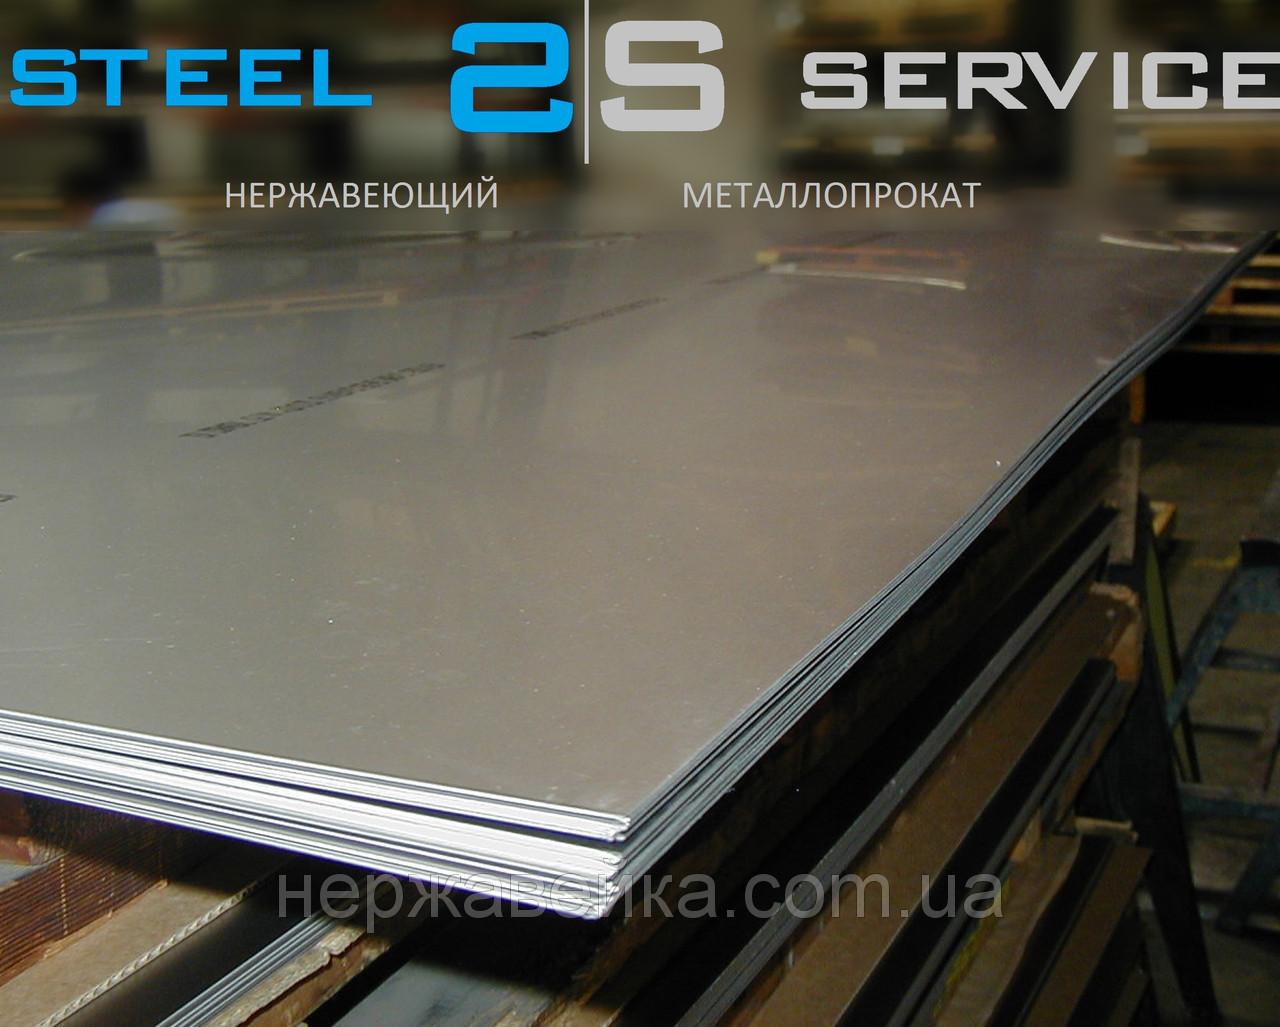 Нержавеющий лист 5х1500х6000мм AISI 430(12Х17) 2B - матовый, технический